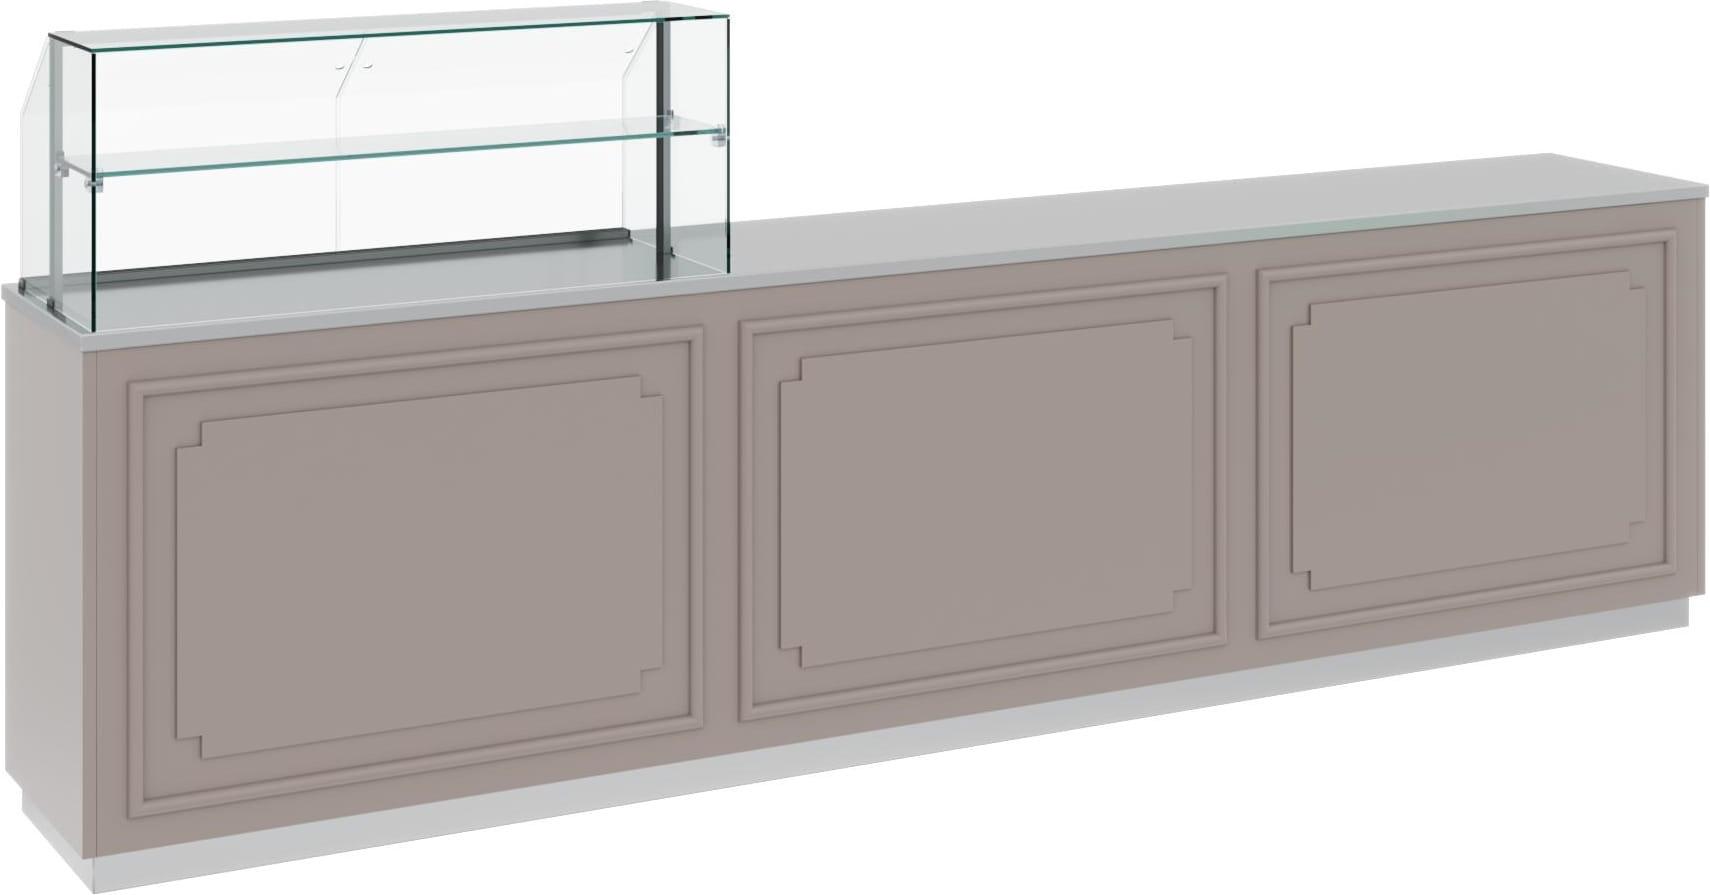 Нейтральная витрина CARBOMA AC40N 1.25-11 - 1